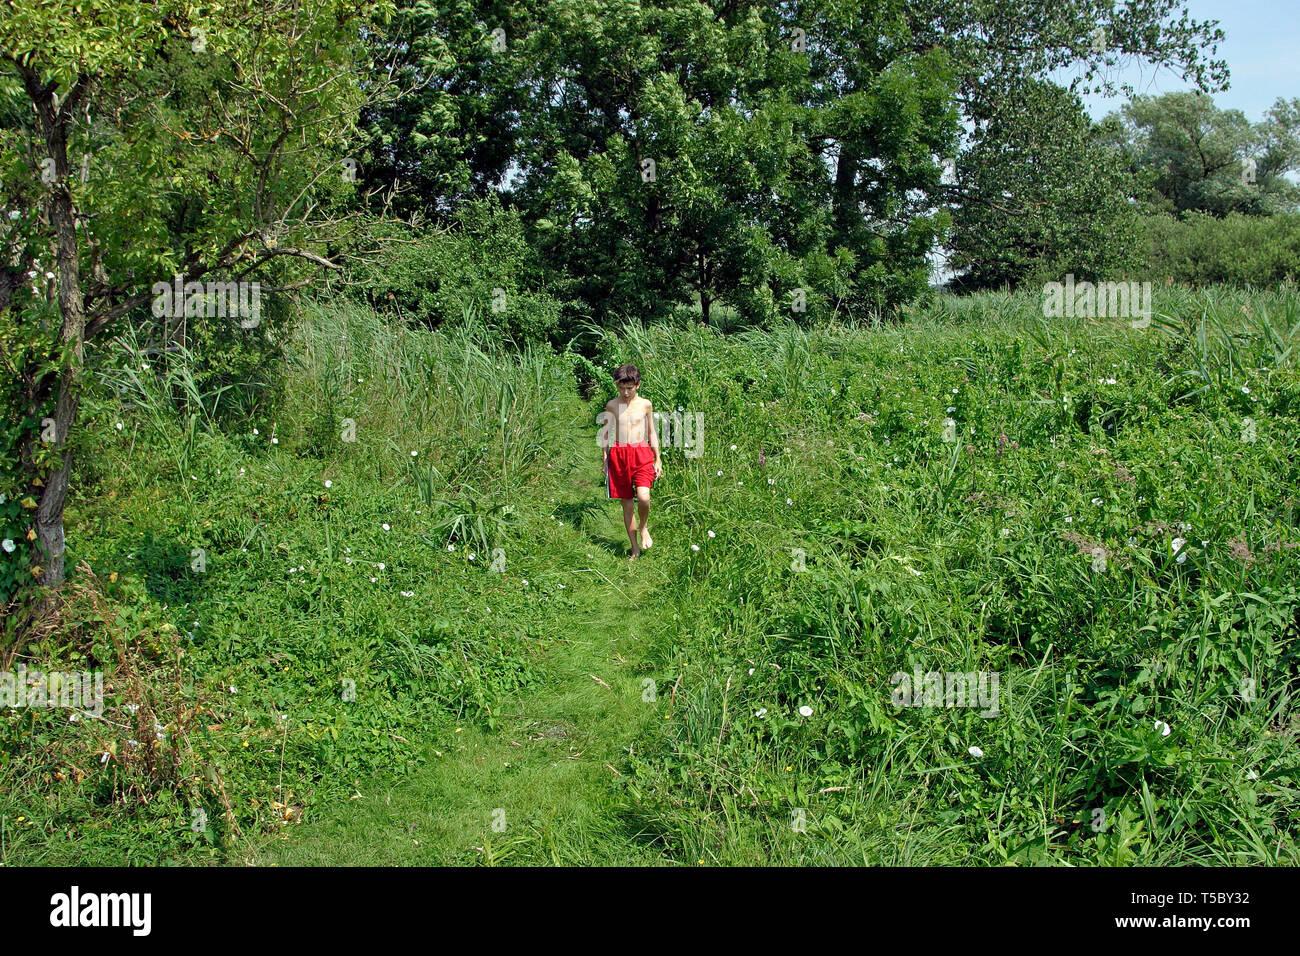 young boy exploring nature - Stock Image